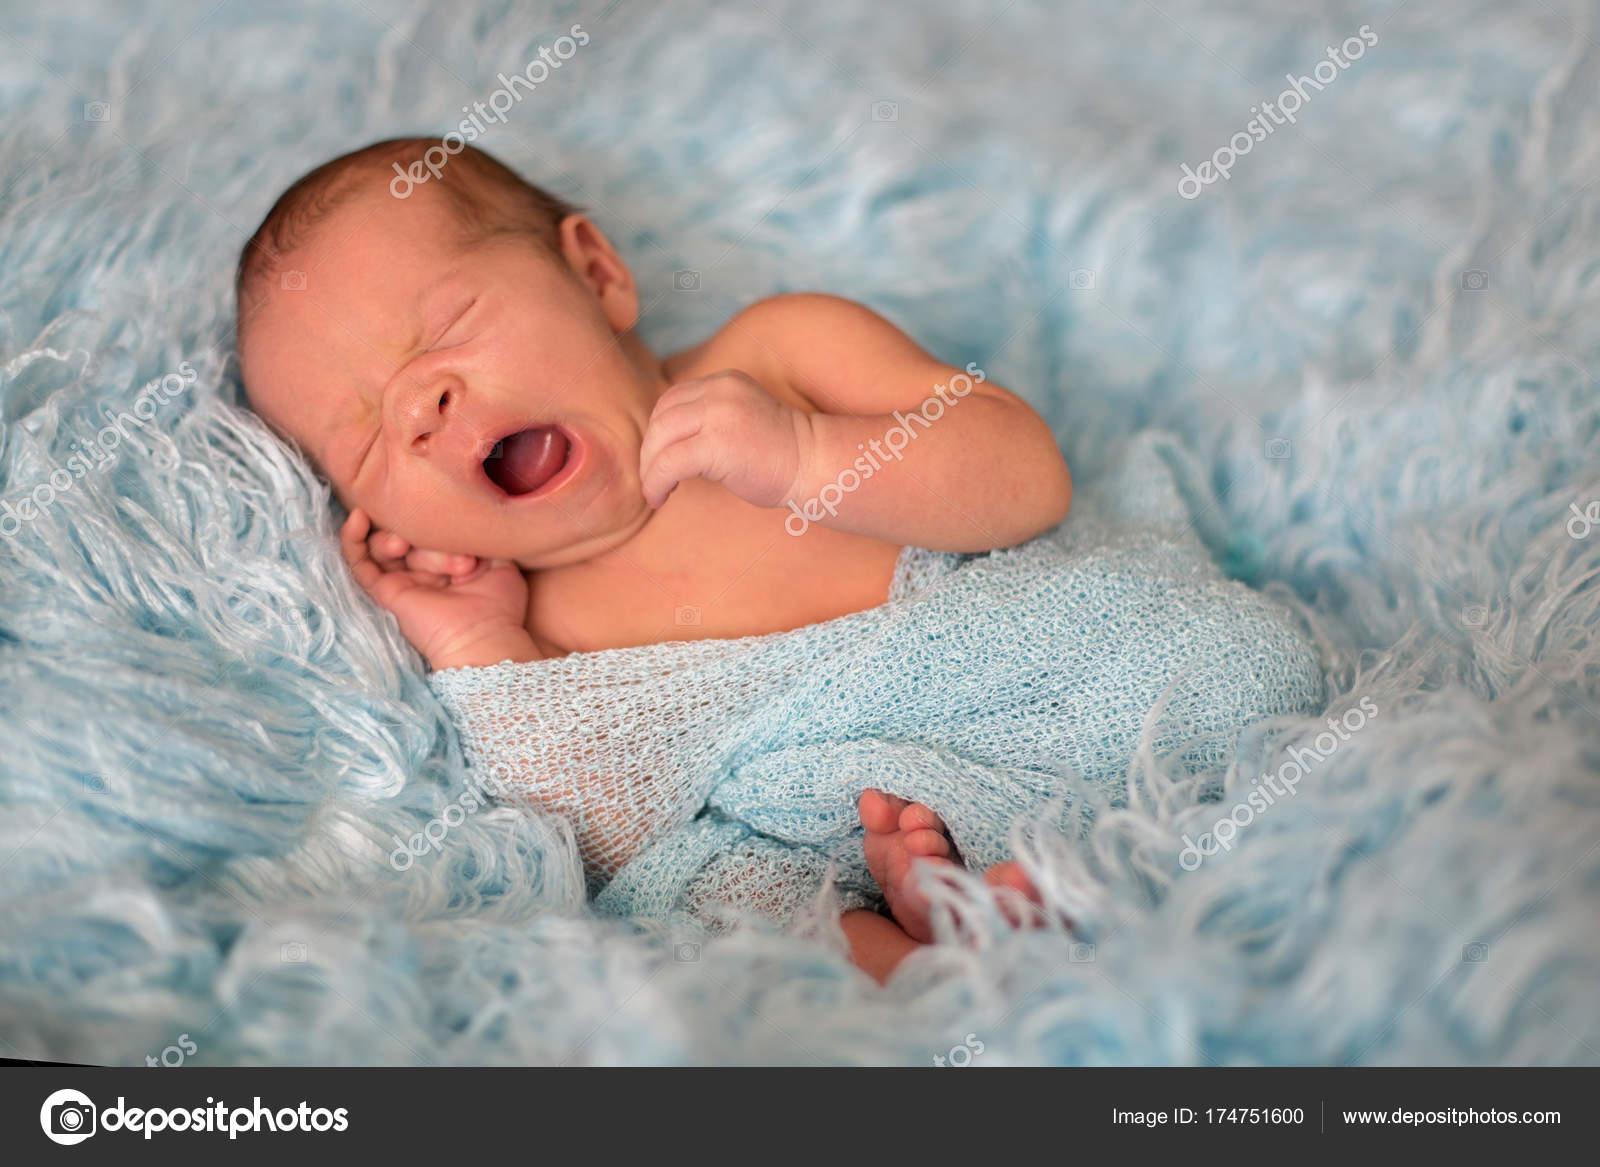 96cf00b1778 Happy smiling newborn baby in wrap